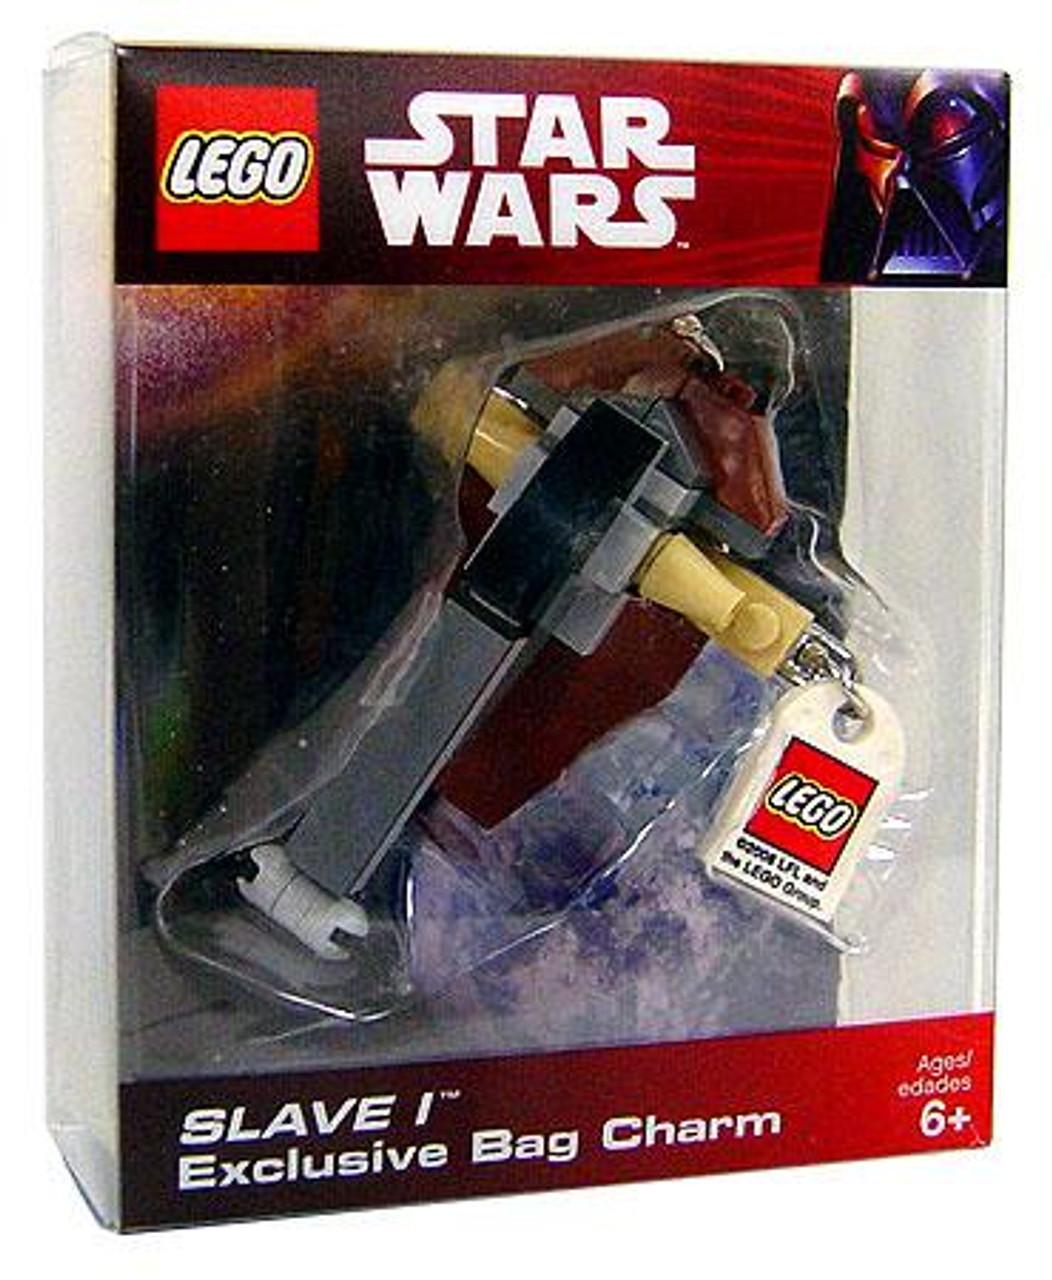 LEGO Star Wars Empire Strikes Back Slave 1 Bag Charm Exclusive